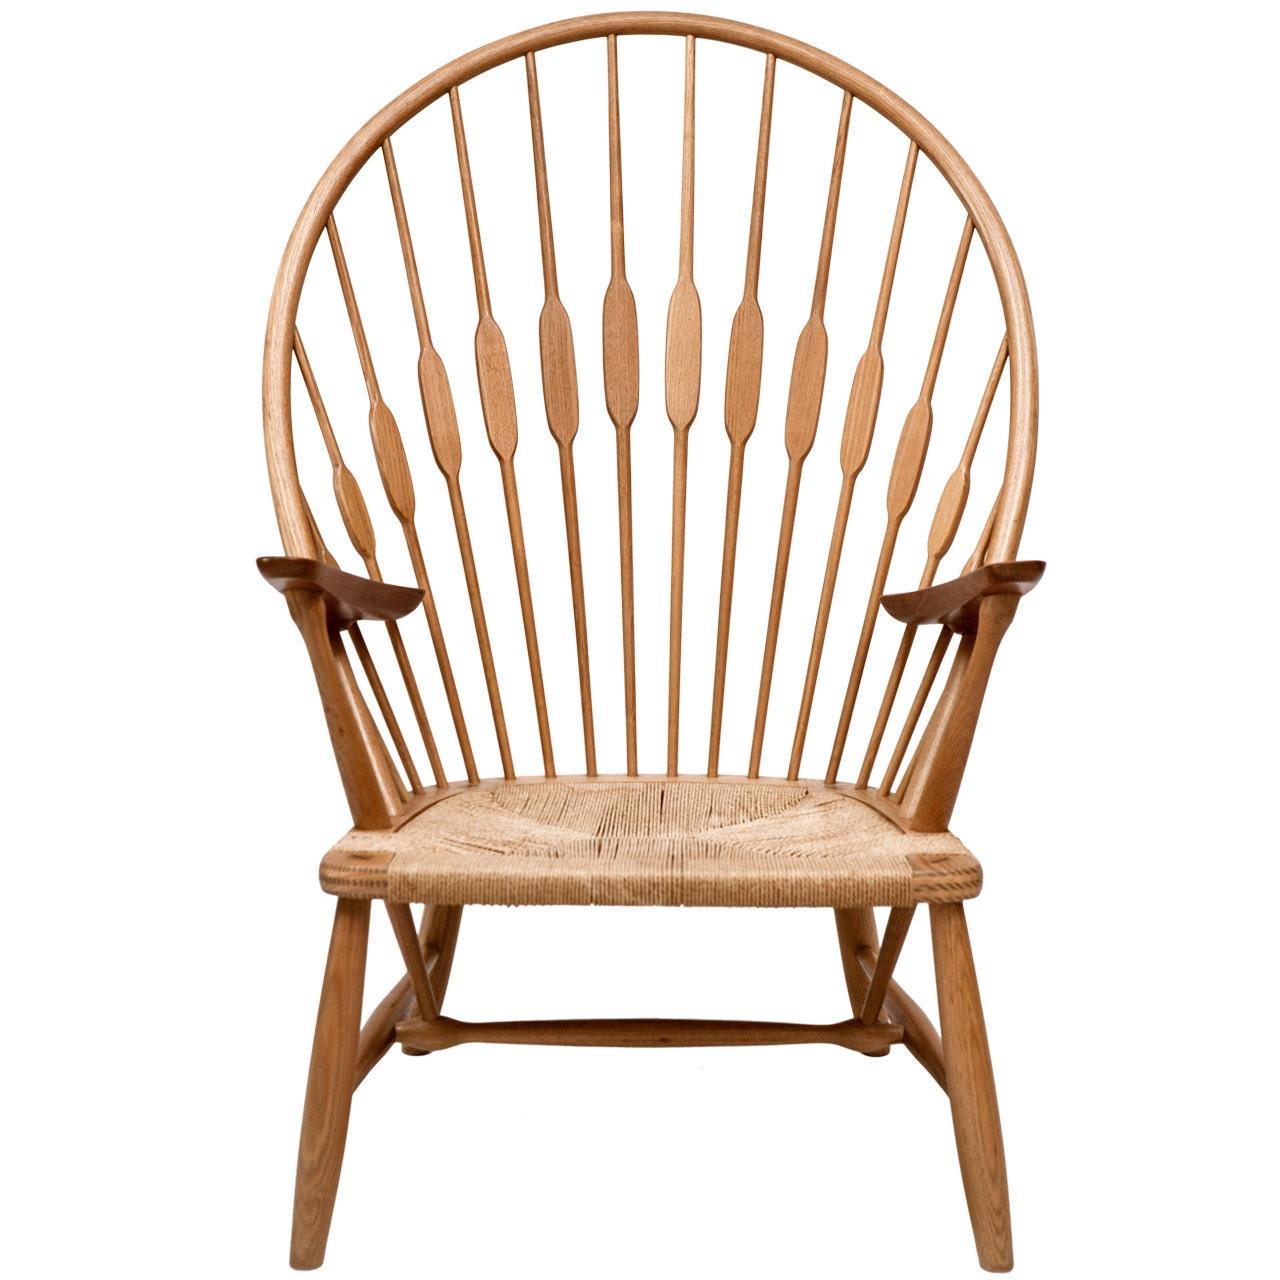 peacock chair by hans wegner. Black Bedroom Furniture Sets. Home Design Ideas